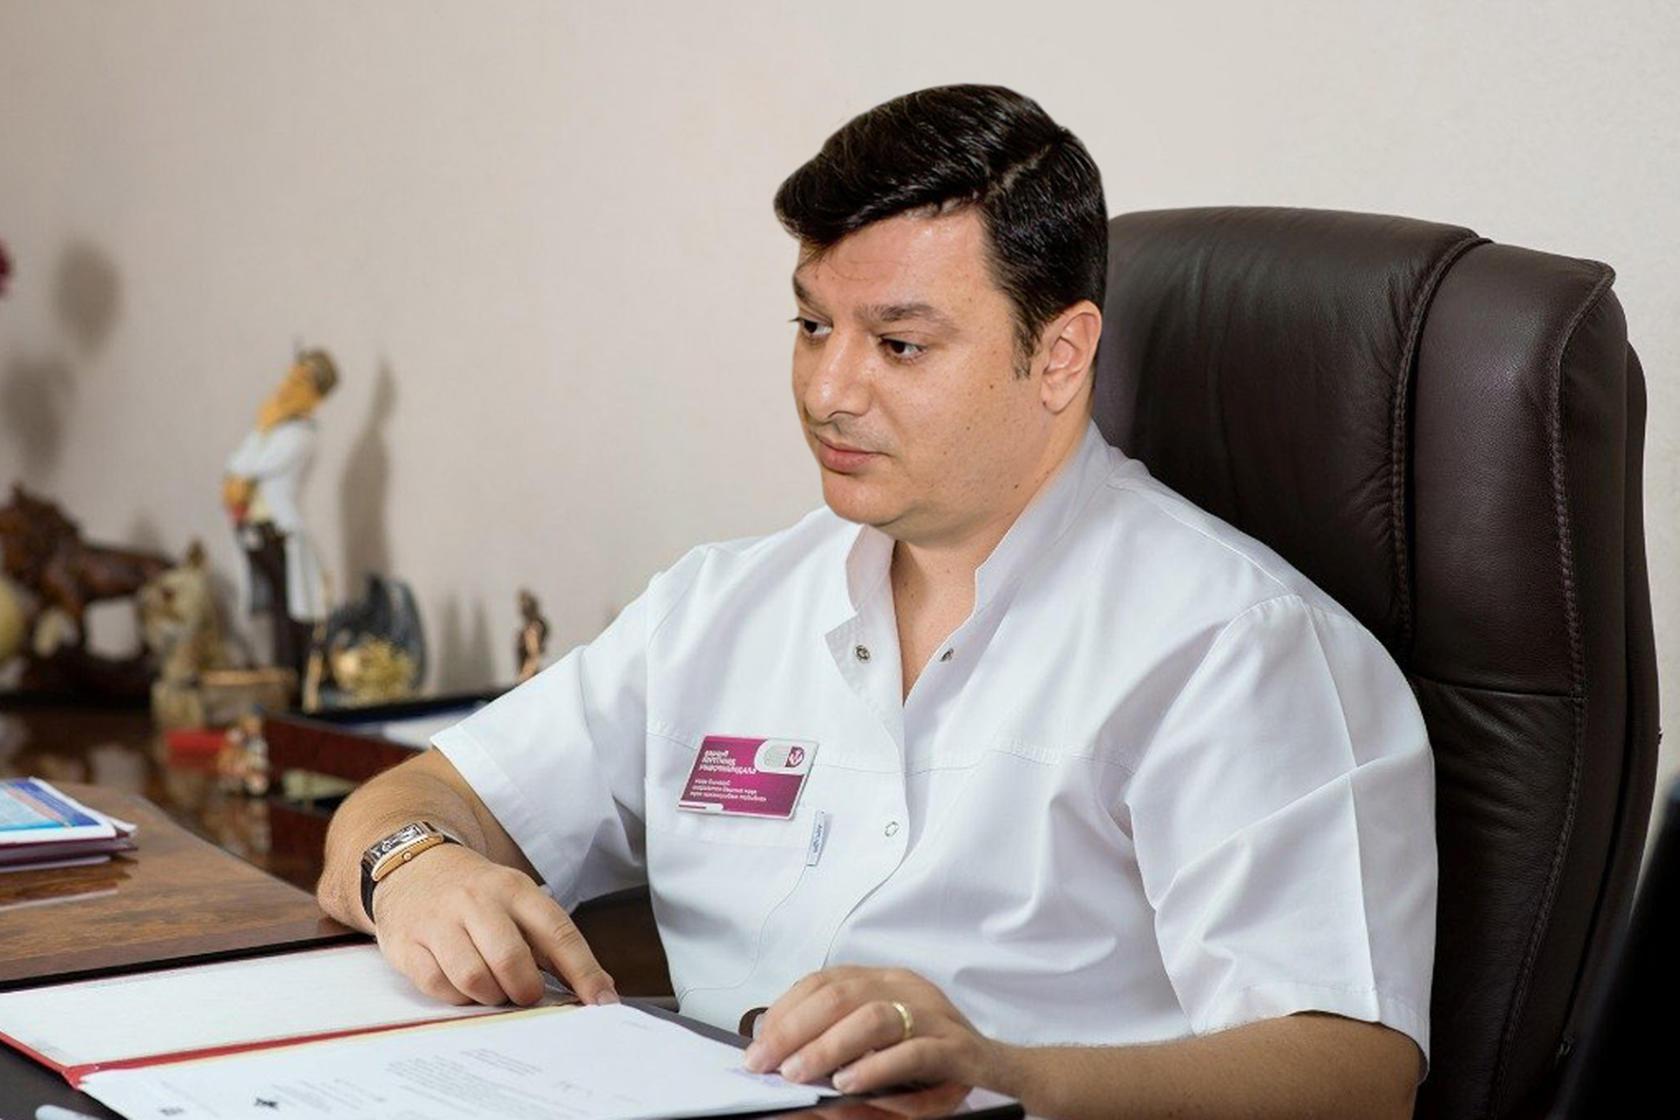 Фархад Росимович Джабаров. Радиолог. Онколог в Ростове-на-Дону